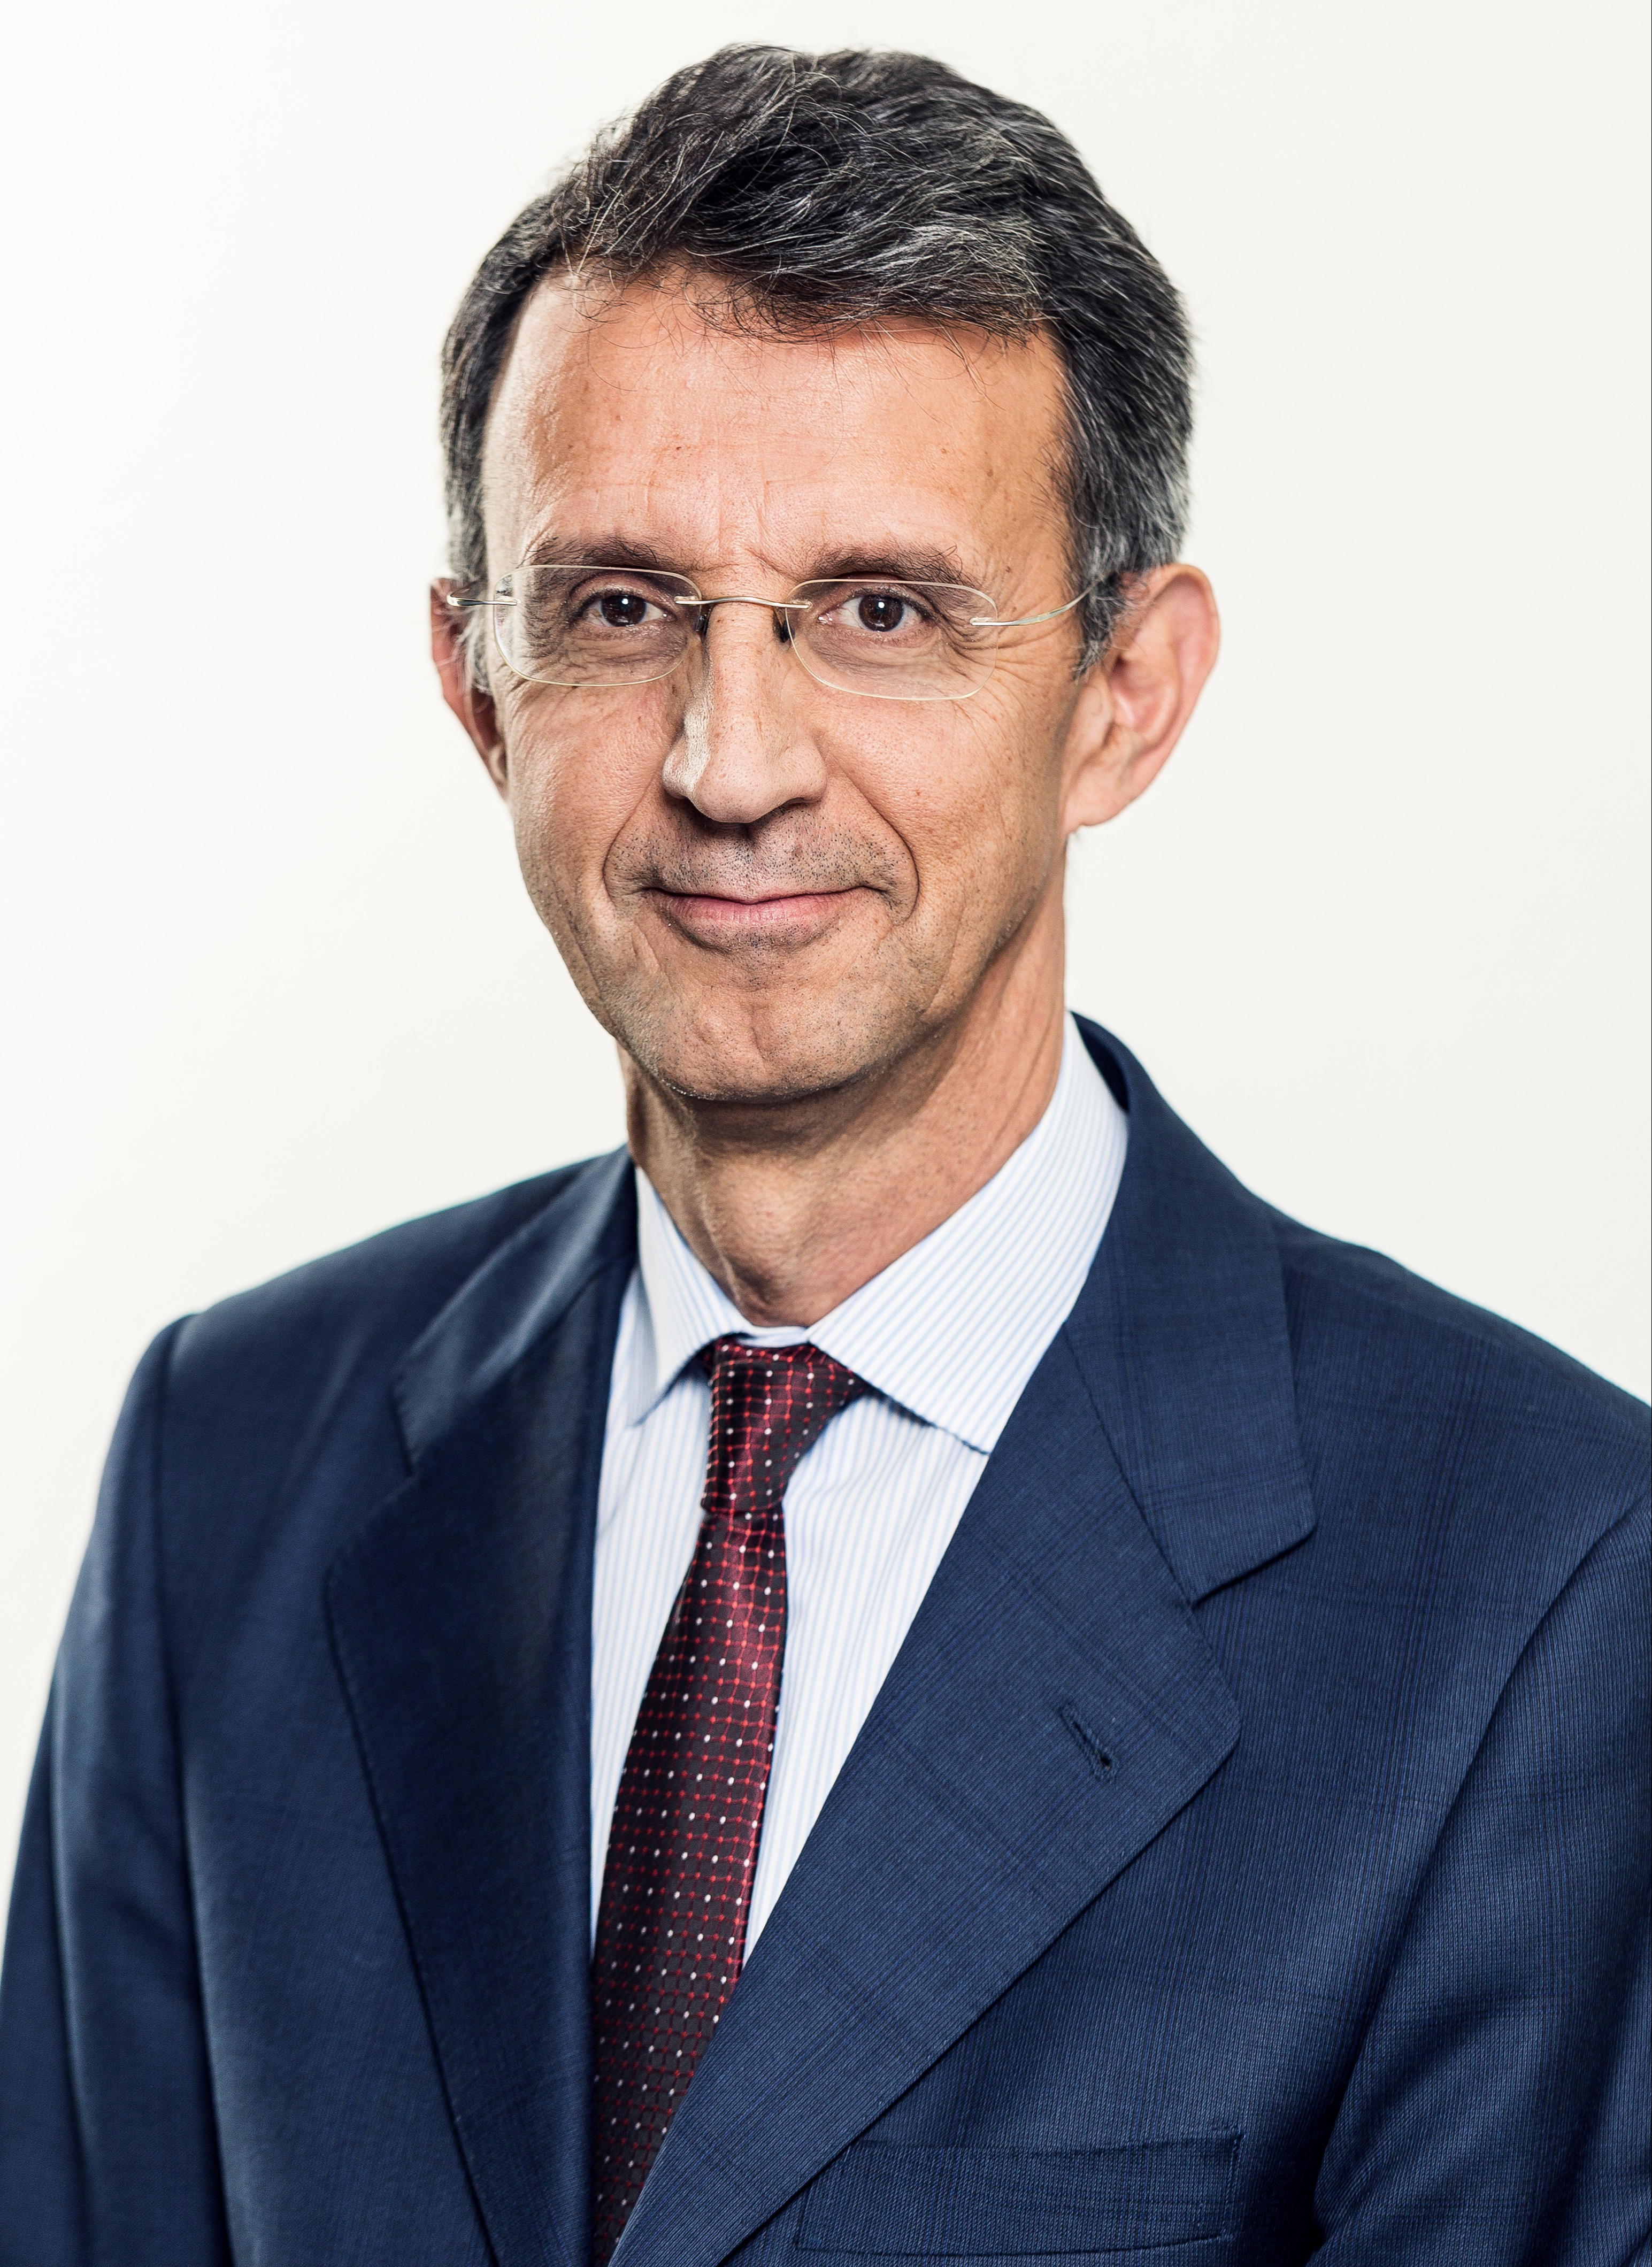 Diego Pavía, Chief Executive Officer